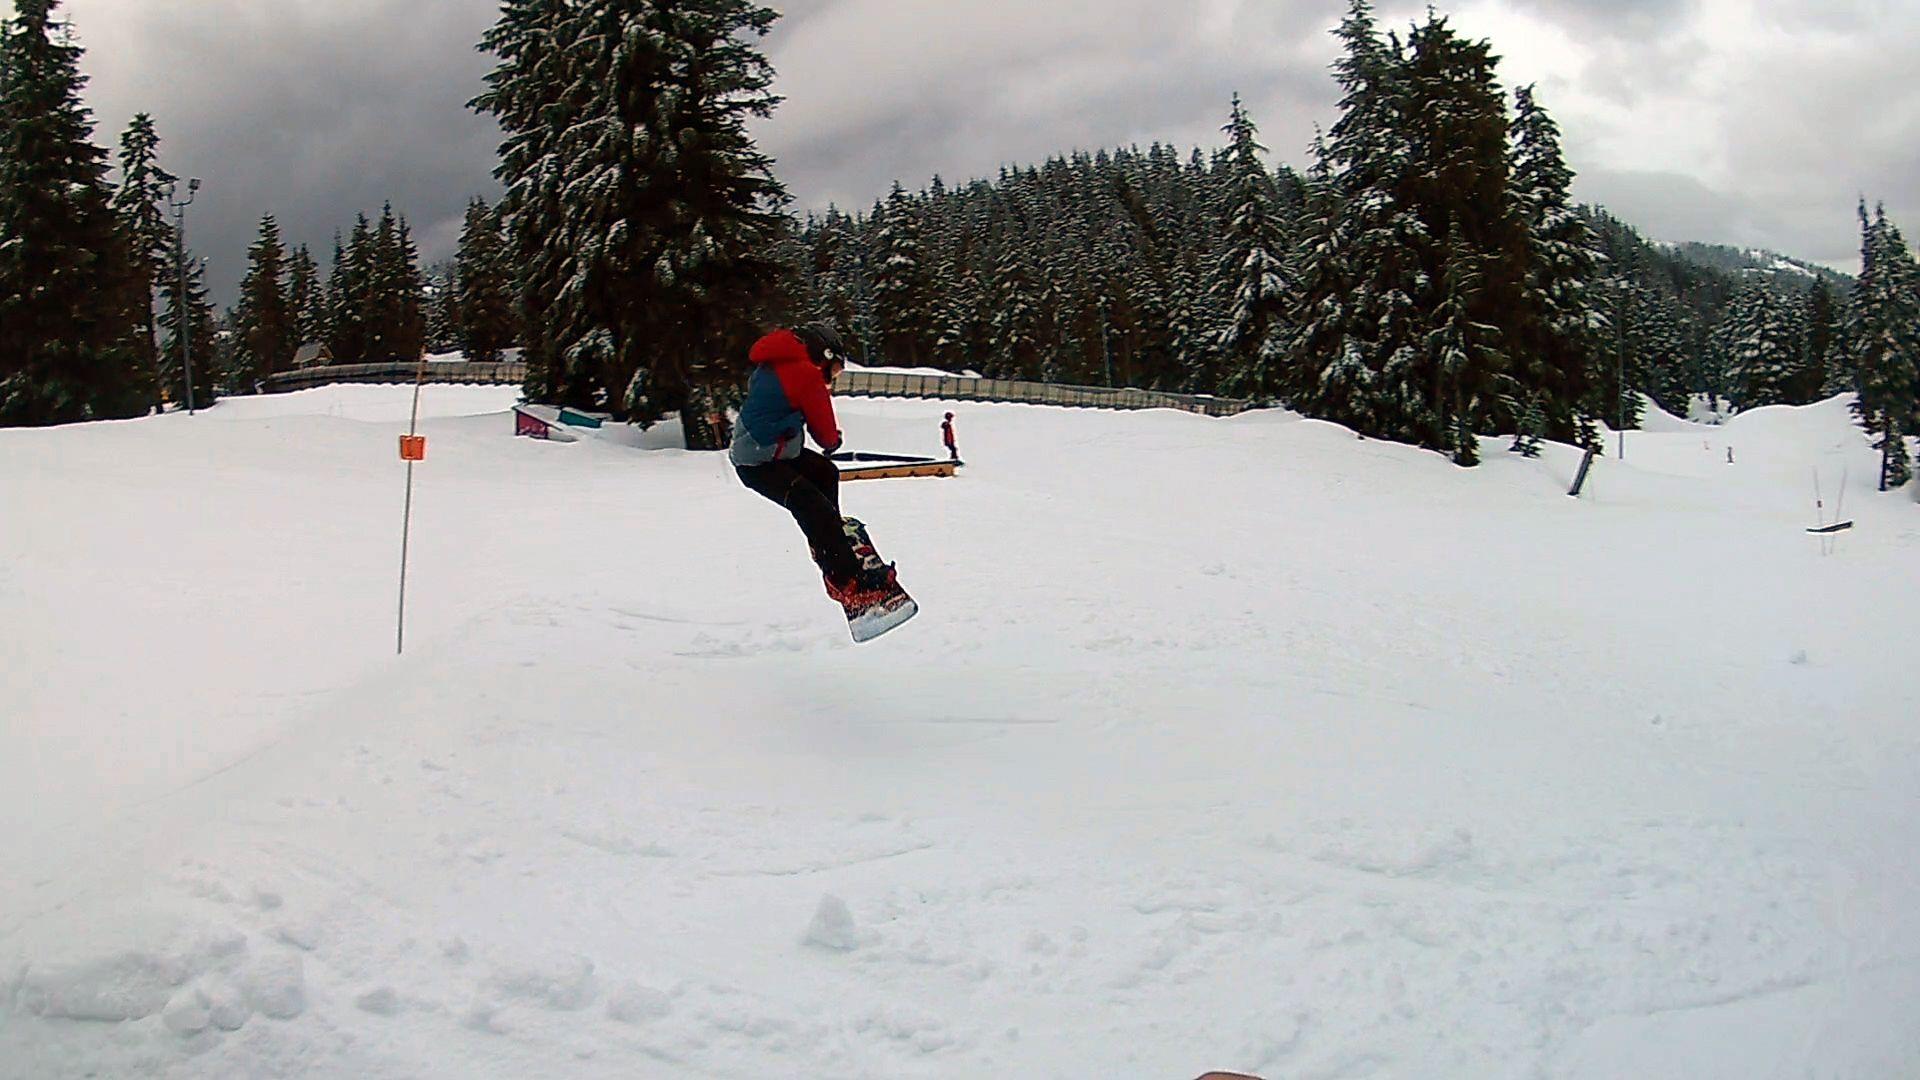 Snowboard 180